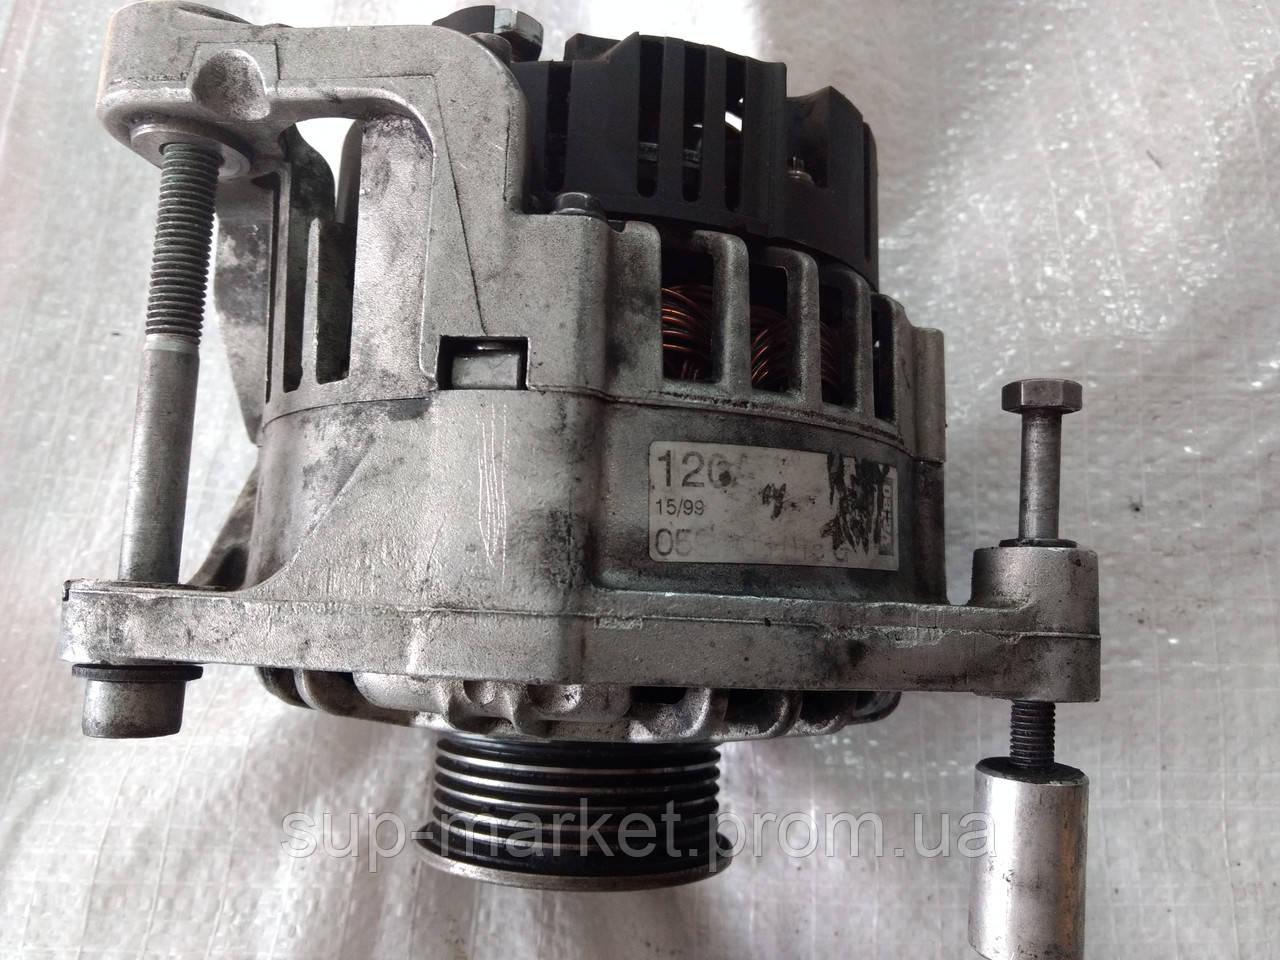 059903015G Генератор Valeo (120 А, 14 В, D шкива 64,5 мм, 6 канавок), Audi A6 C5 1997 - 2004